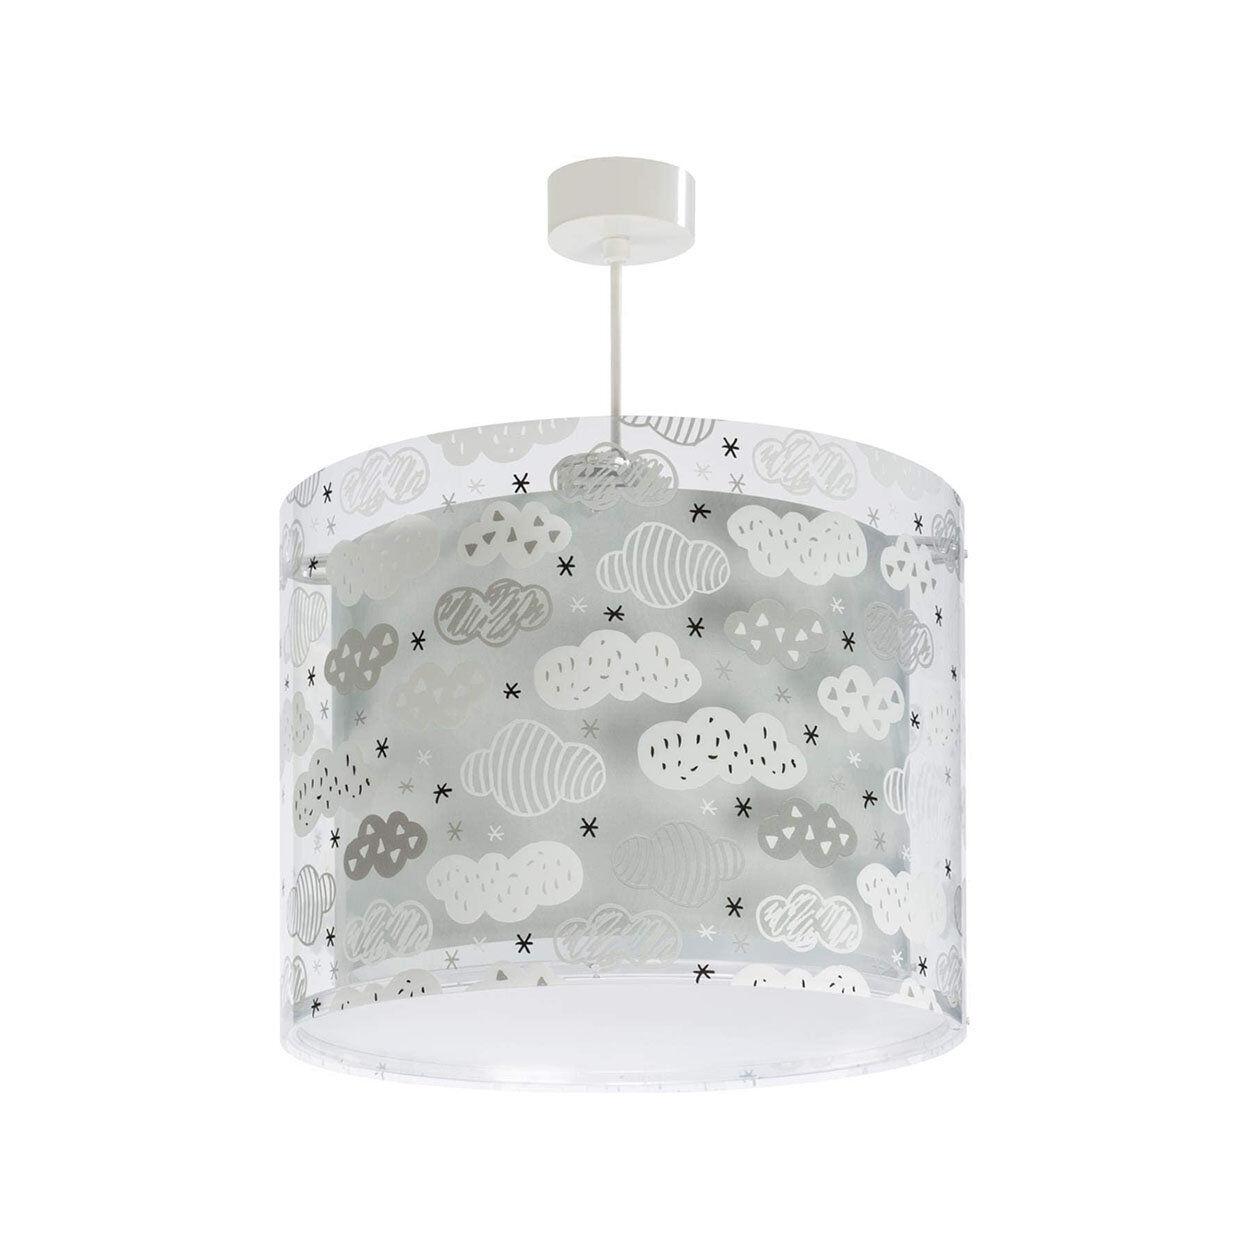 cameretta lampadario sospensione nuvolette grigie, multicolore